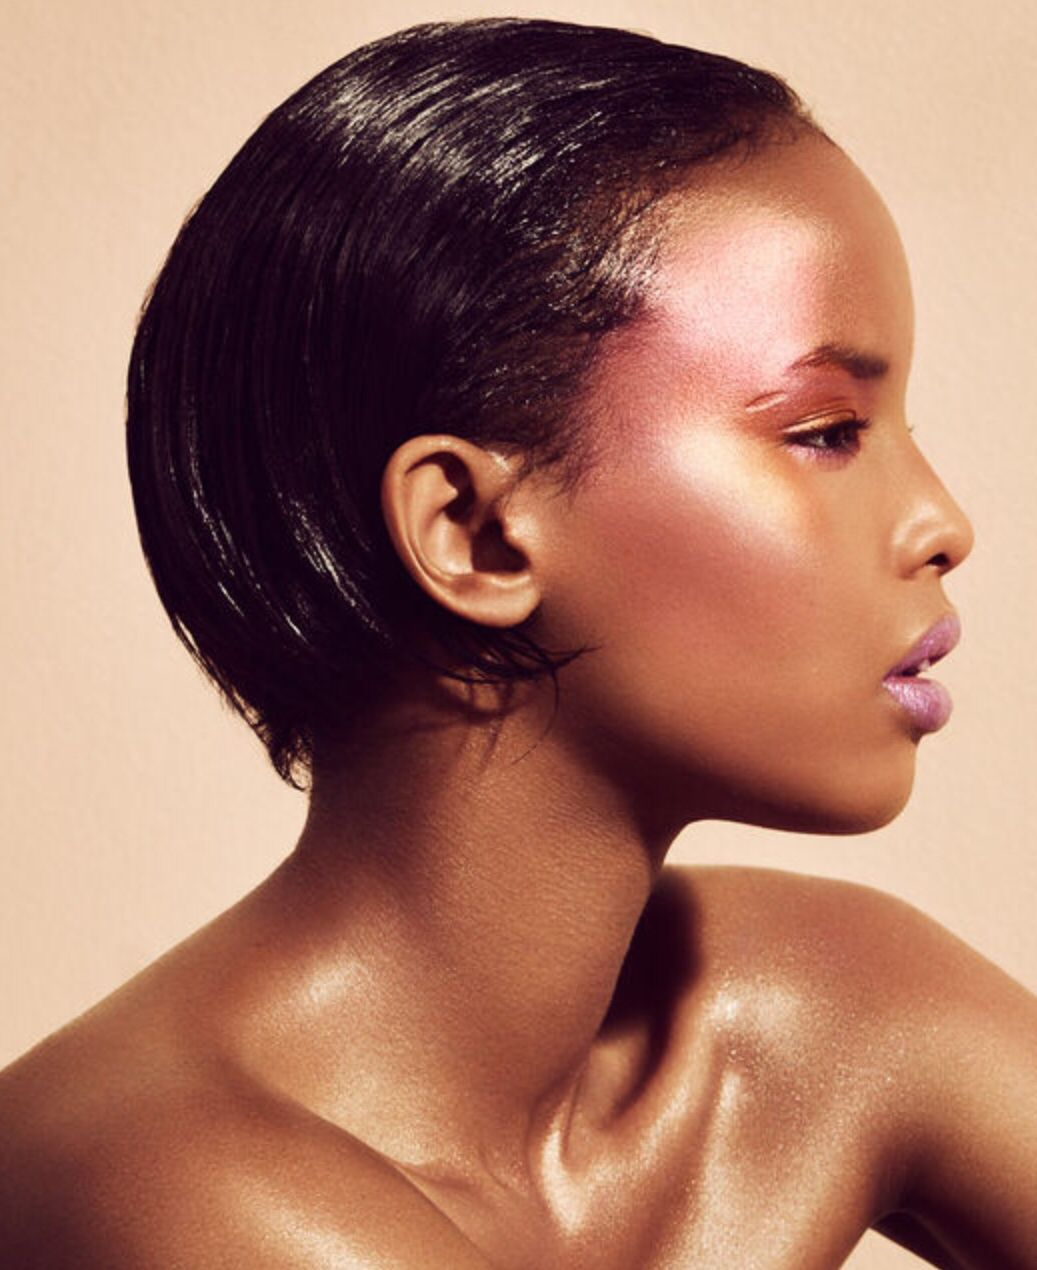 FrenchEconomie️ Spring/Summer 2018 Makeup LookBook: Fenty Beauty Killawatt Foil Highlighter Duo